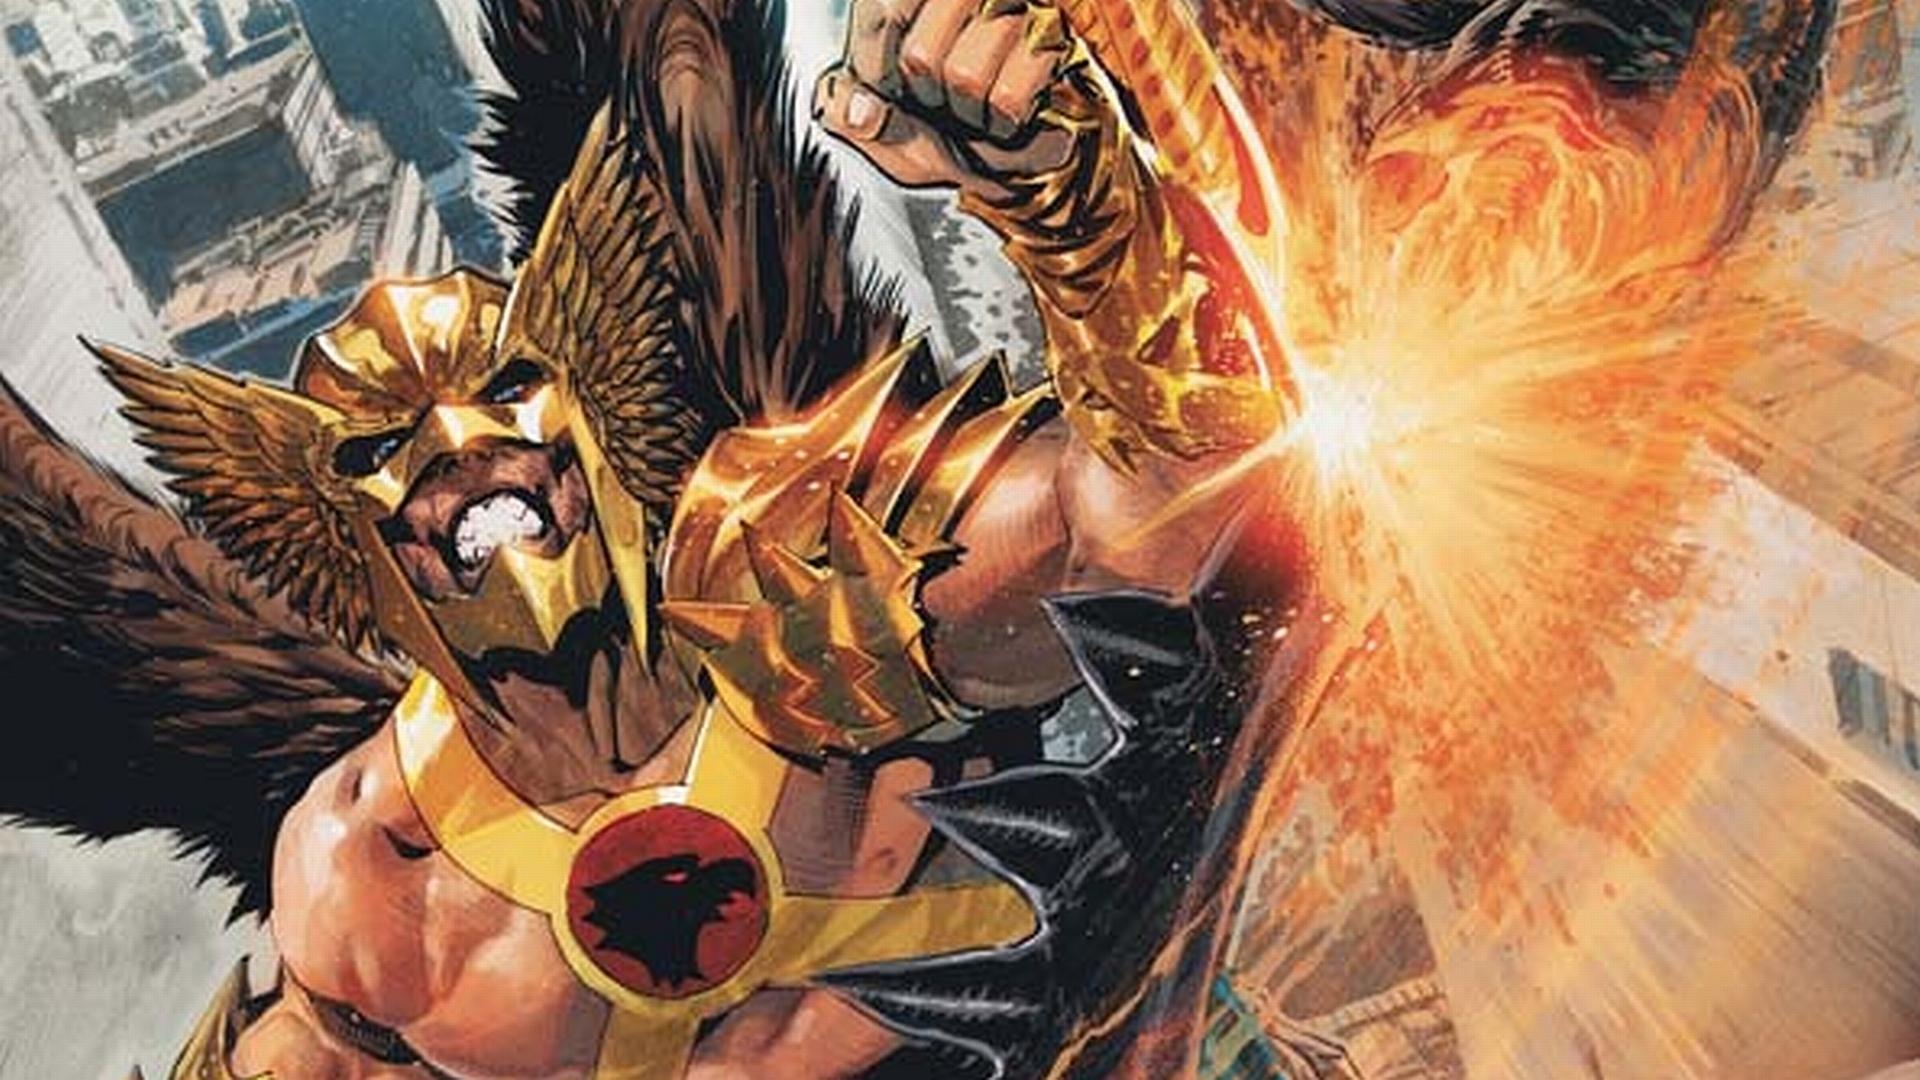 Hawkman Comics wallpapers HD quality